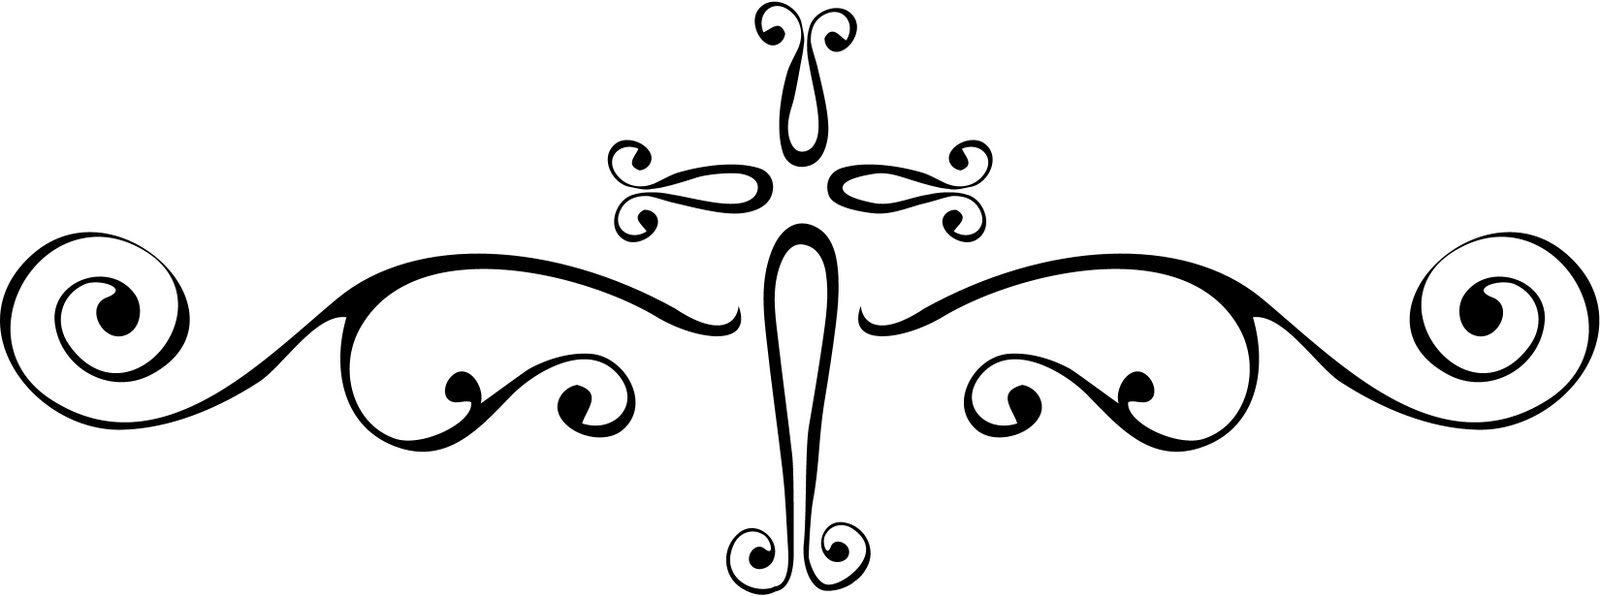 Filigree Cross Clip Art ..-Filigree Cross Clip Art ..-12